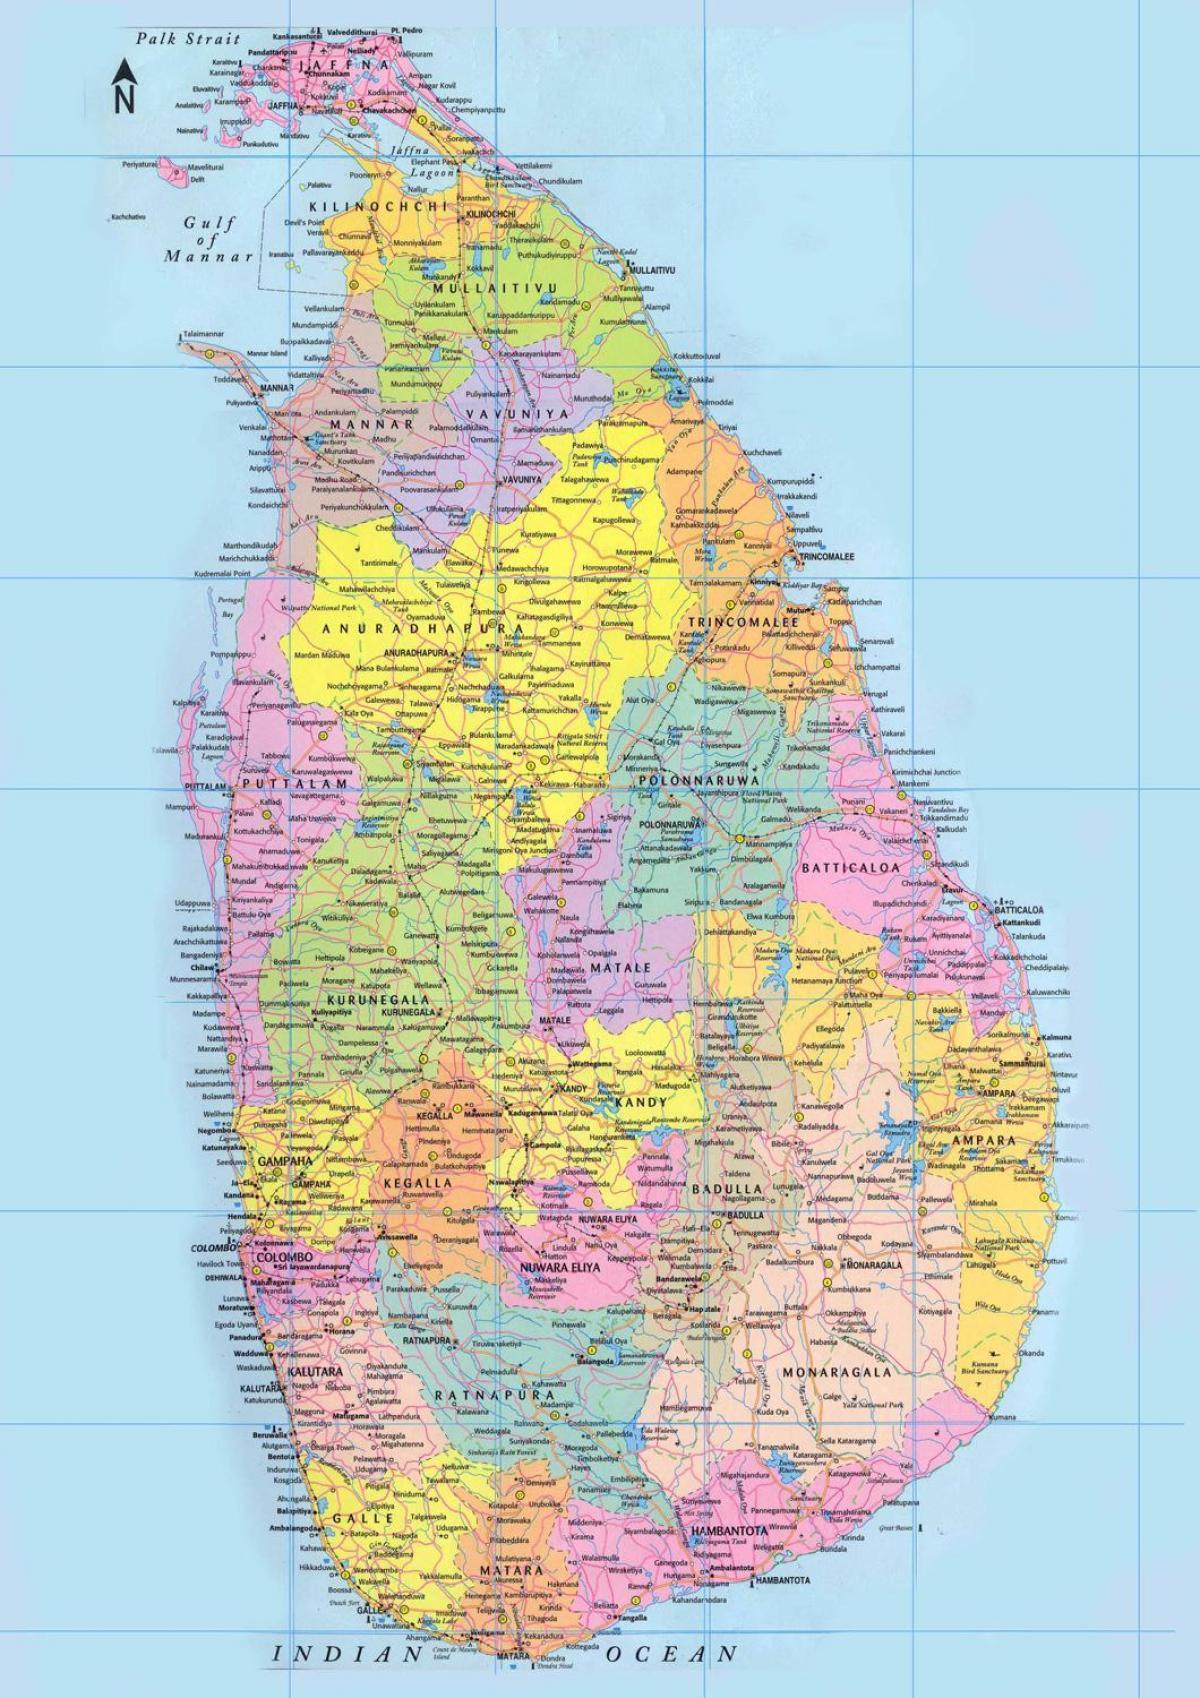 Sri Lanka Veje Kort Sri Lanka Road Kort Afstand Km Sydlige